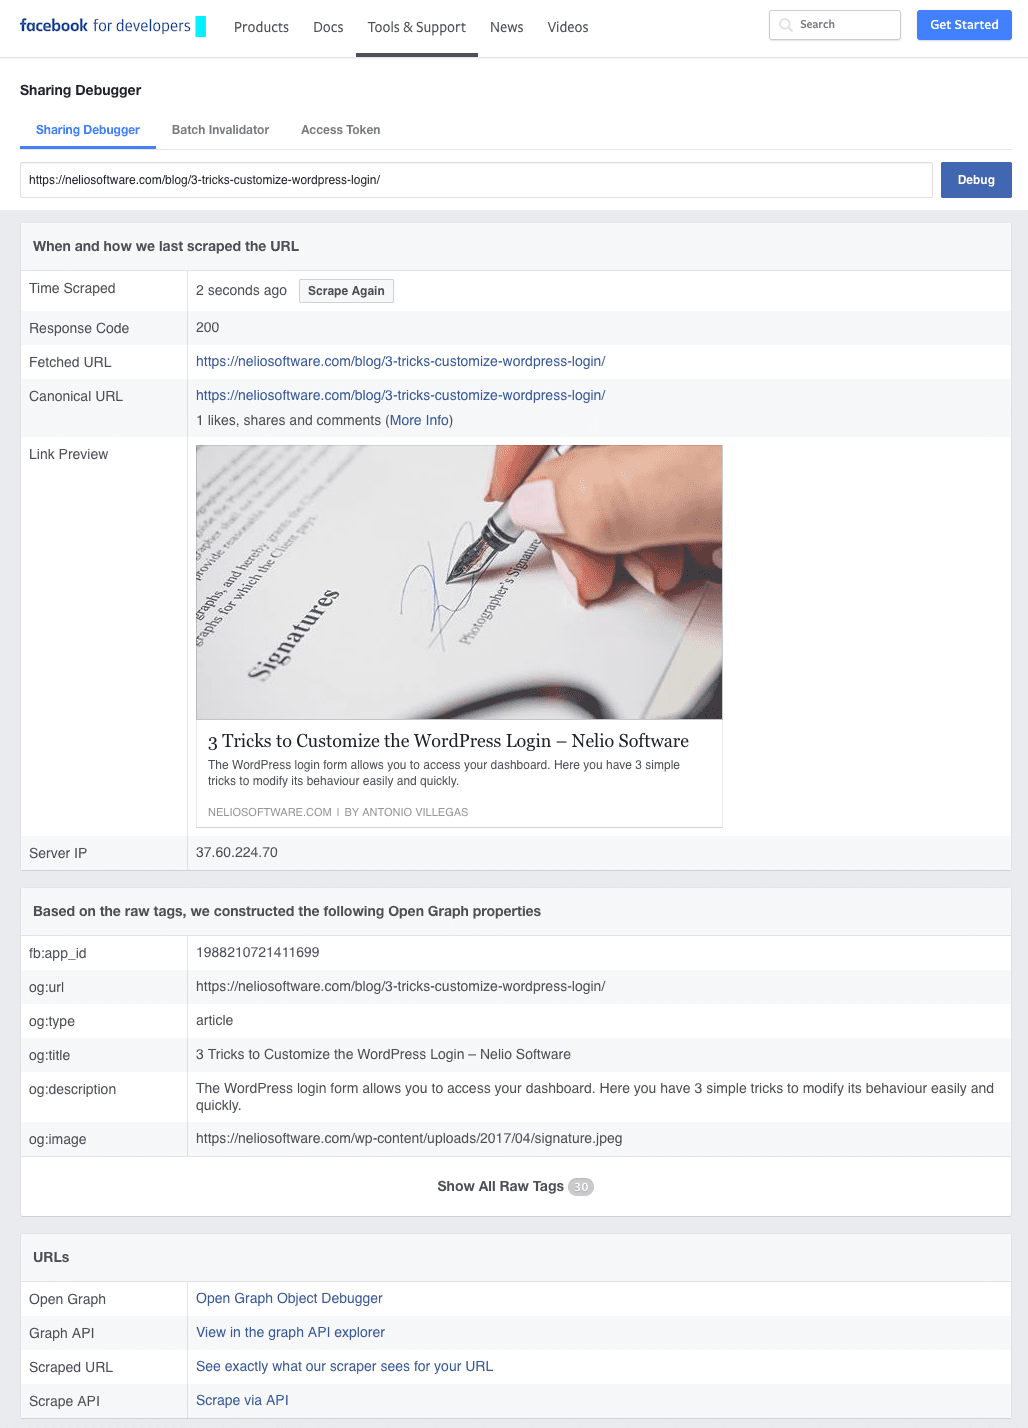 Screenshot of Facebook sharing debugger.